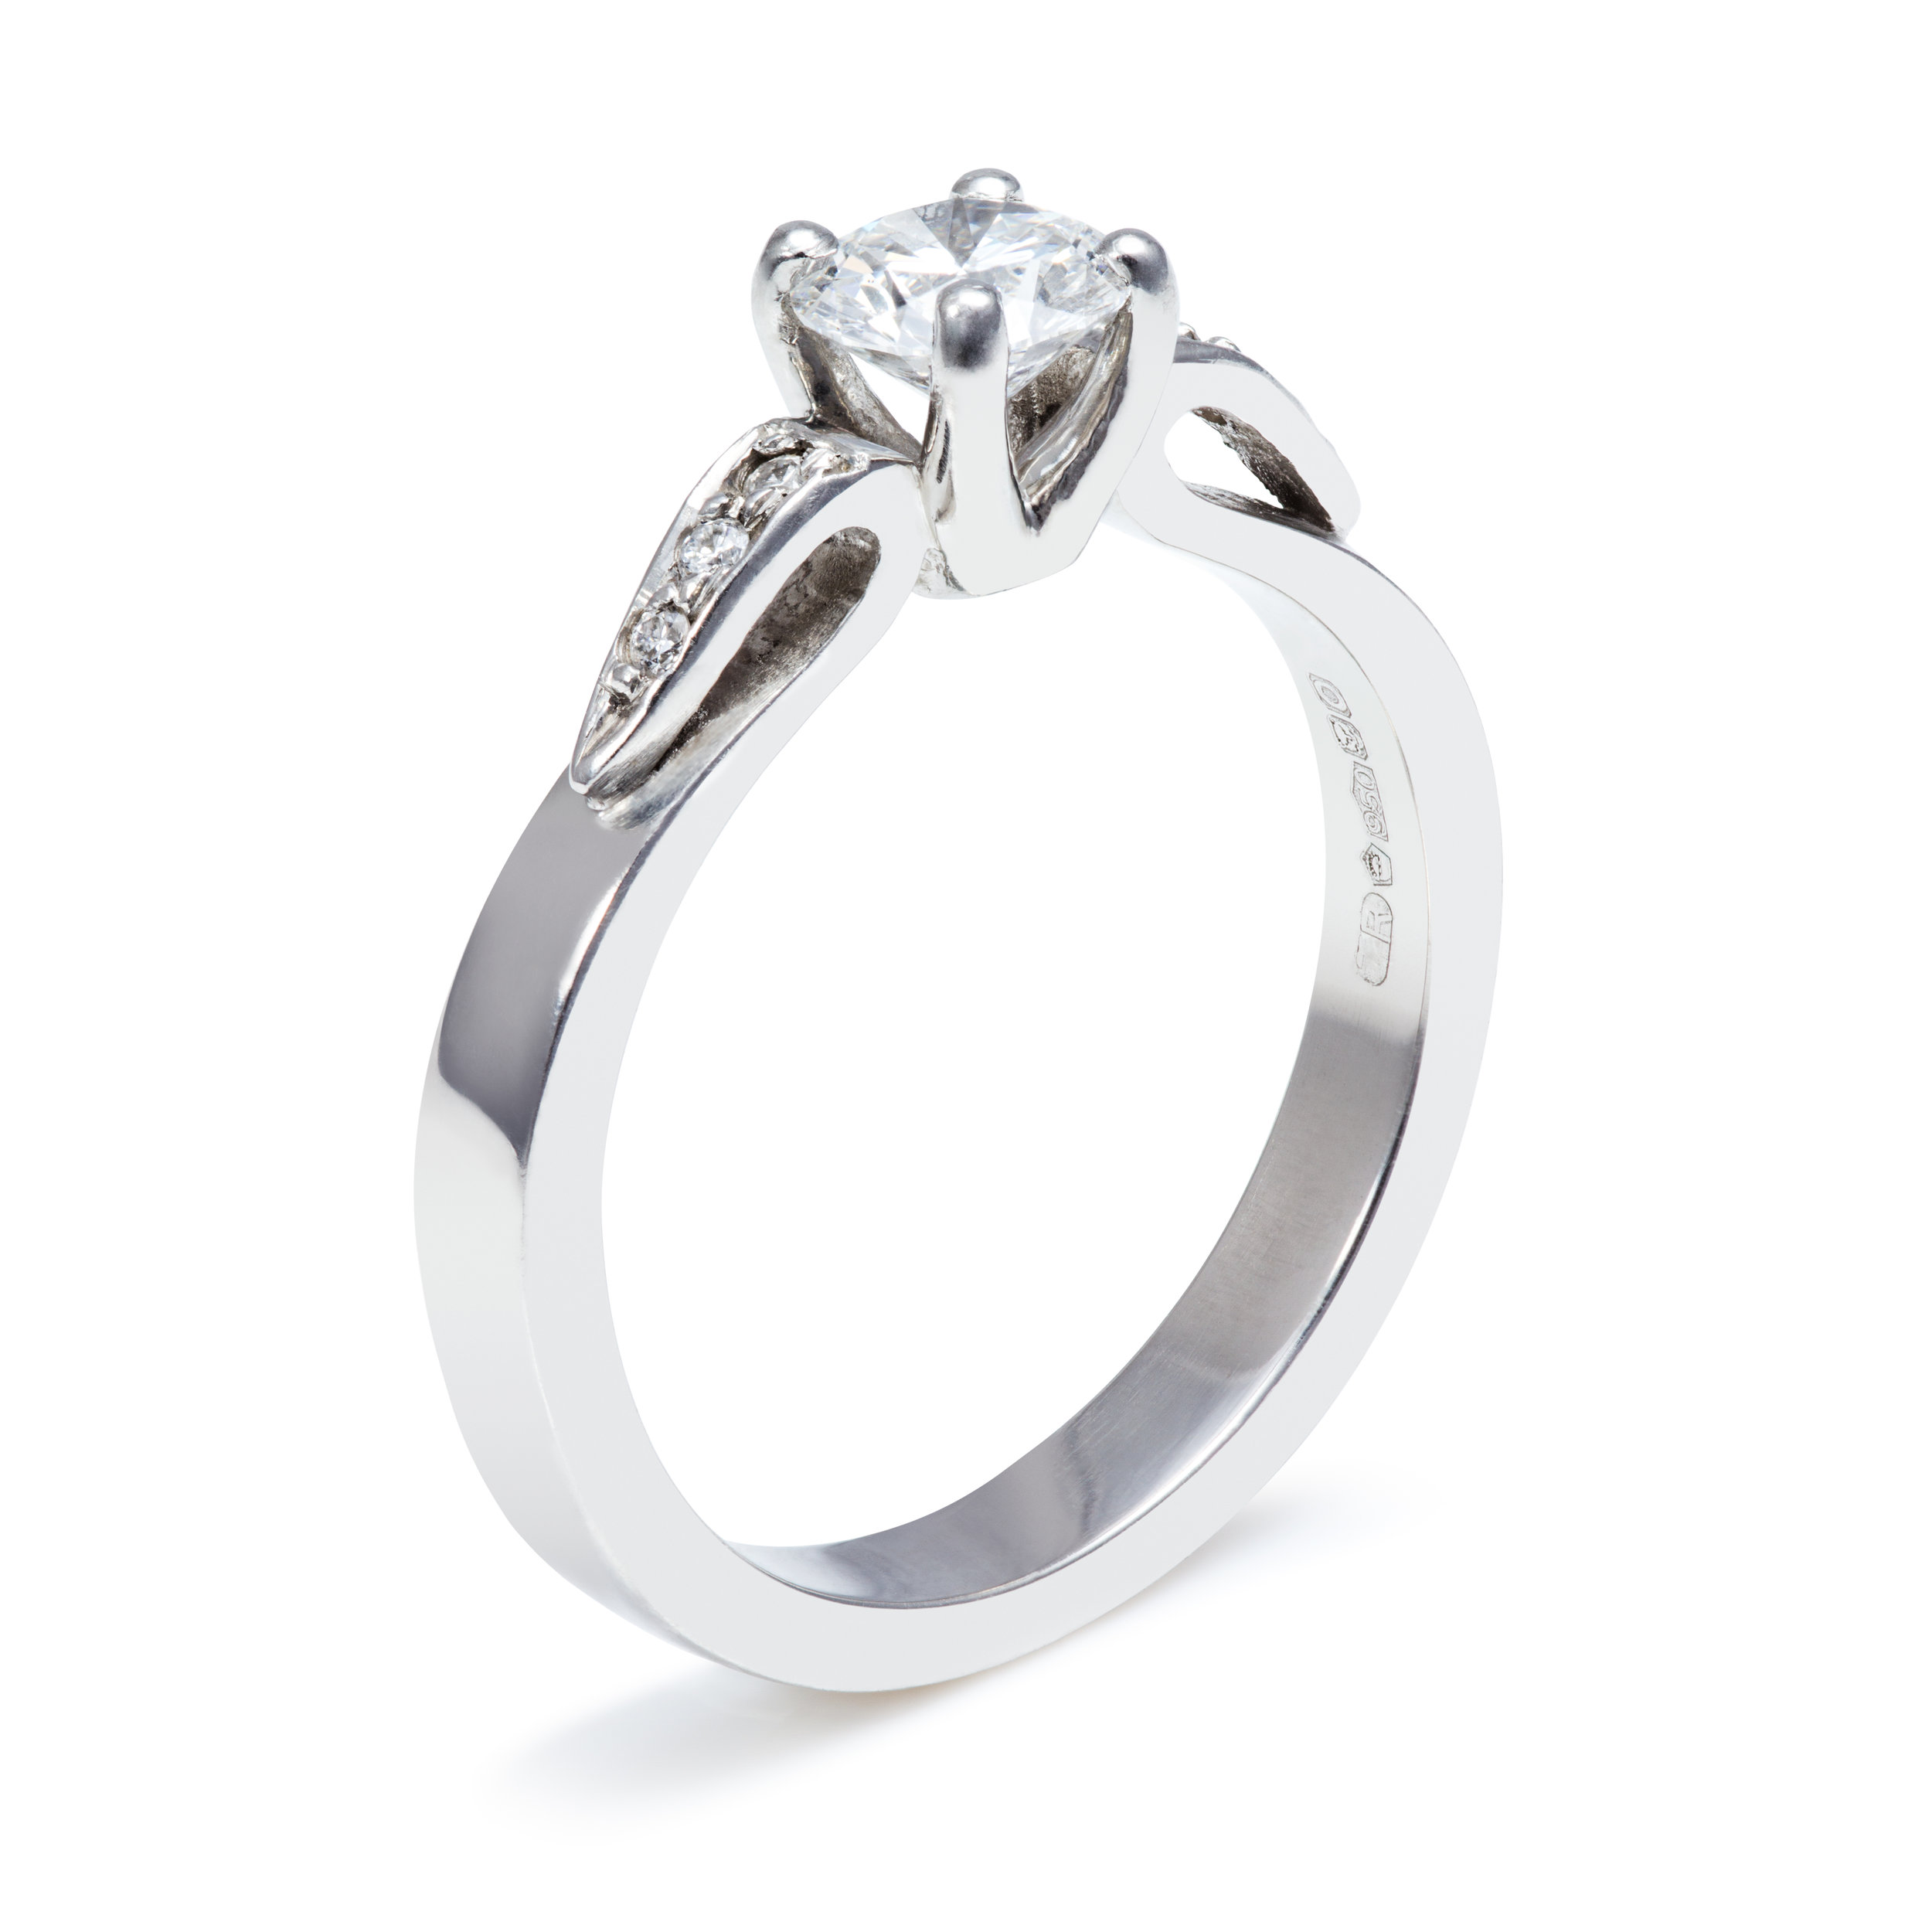 Bespoke platinum and diamond engagement ring commission